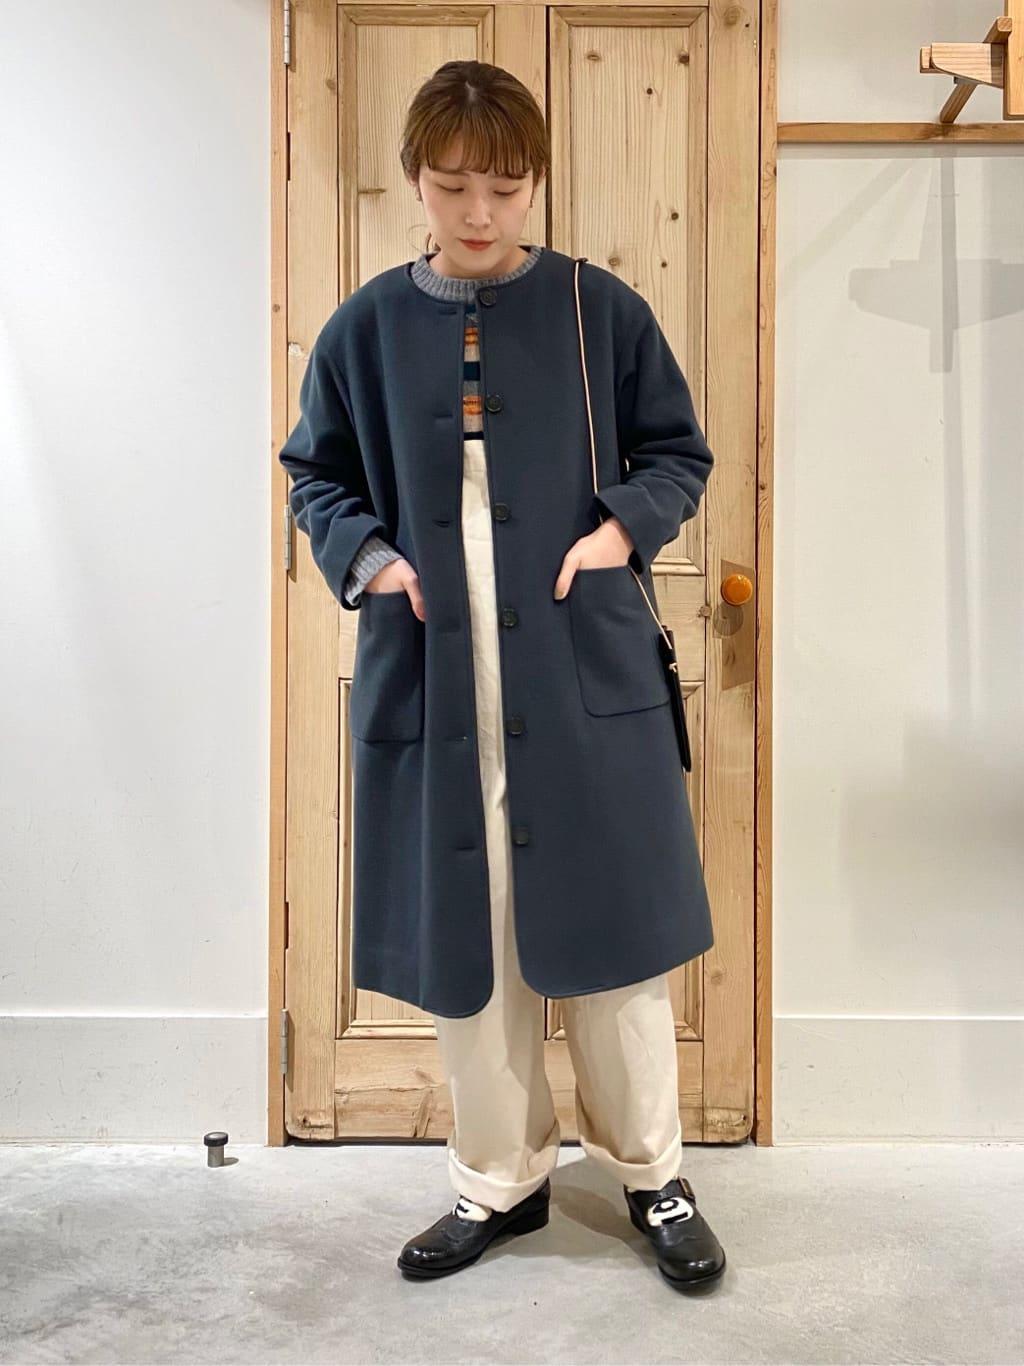 Malle chambre de charme 調布パルコ 身長:160cm 2021.10.01